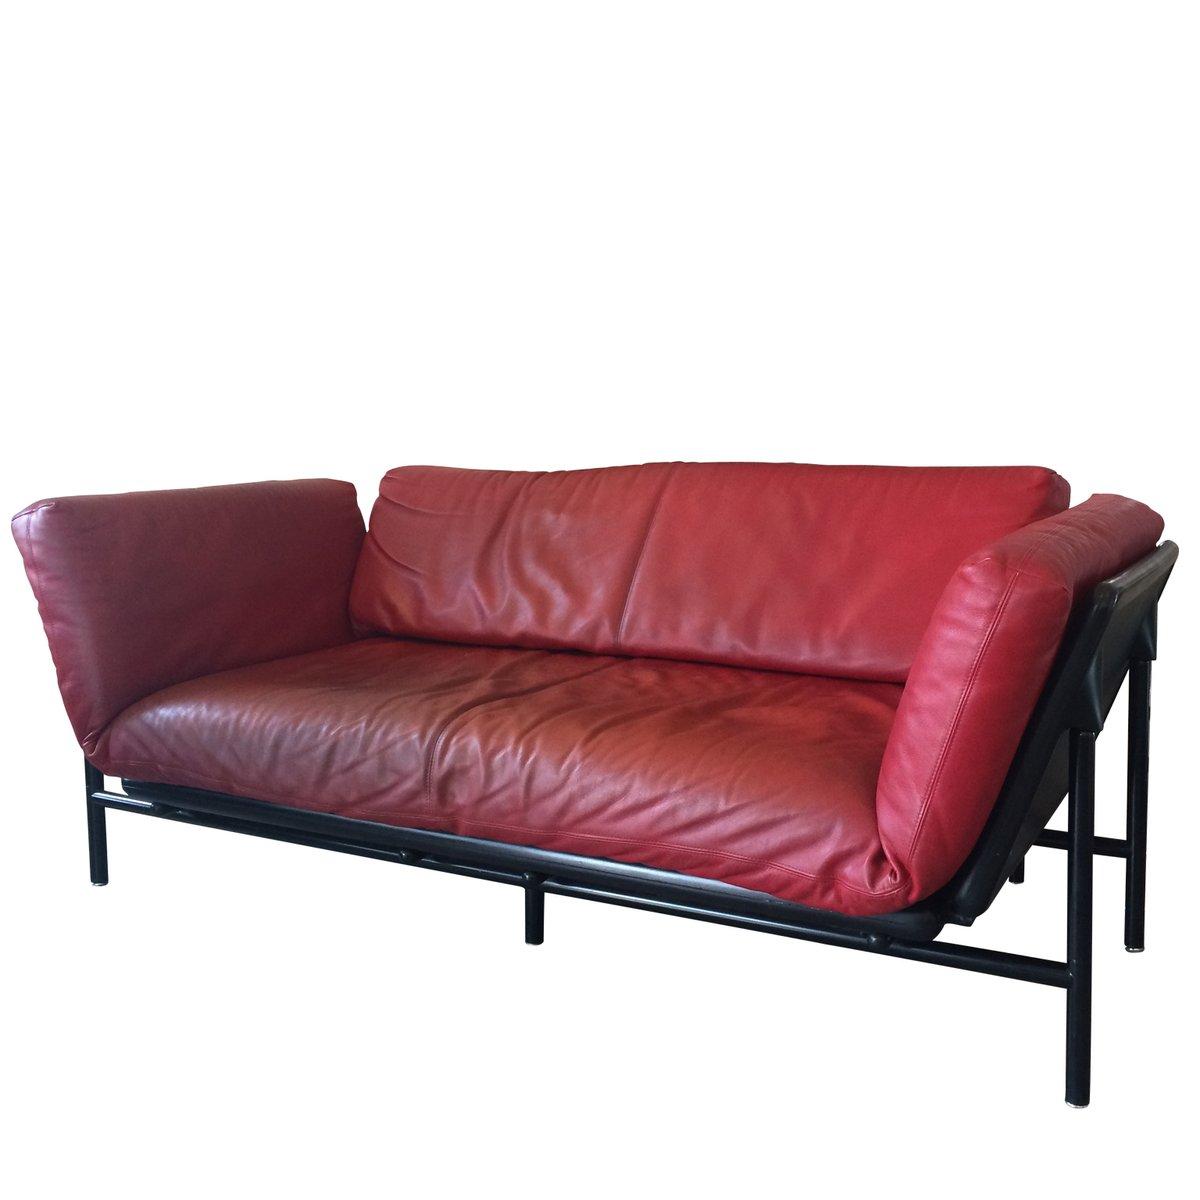 ratapan sofa von roberto tapinassi f r dema italy 1983 bei pamono kaufen. Black Bedroom Furniture Sets. Home Design Ideas